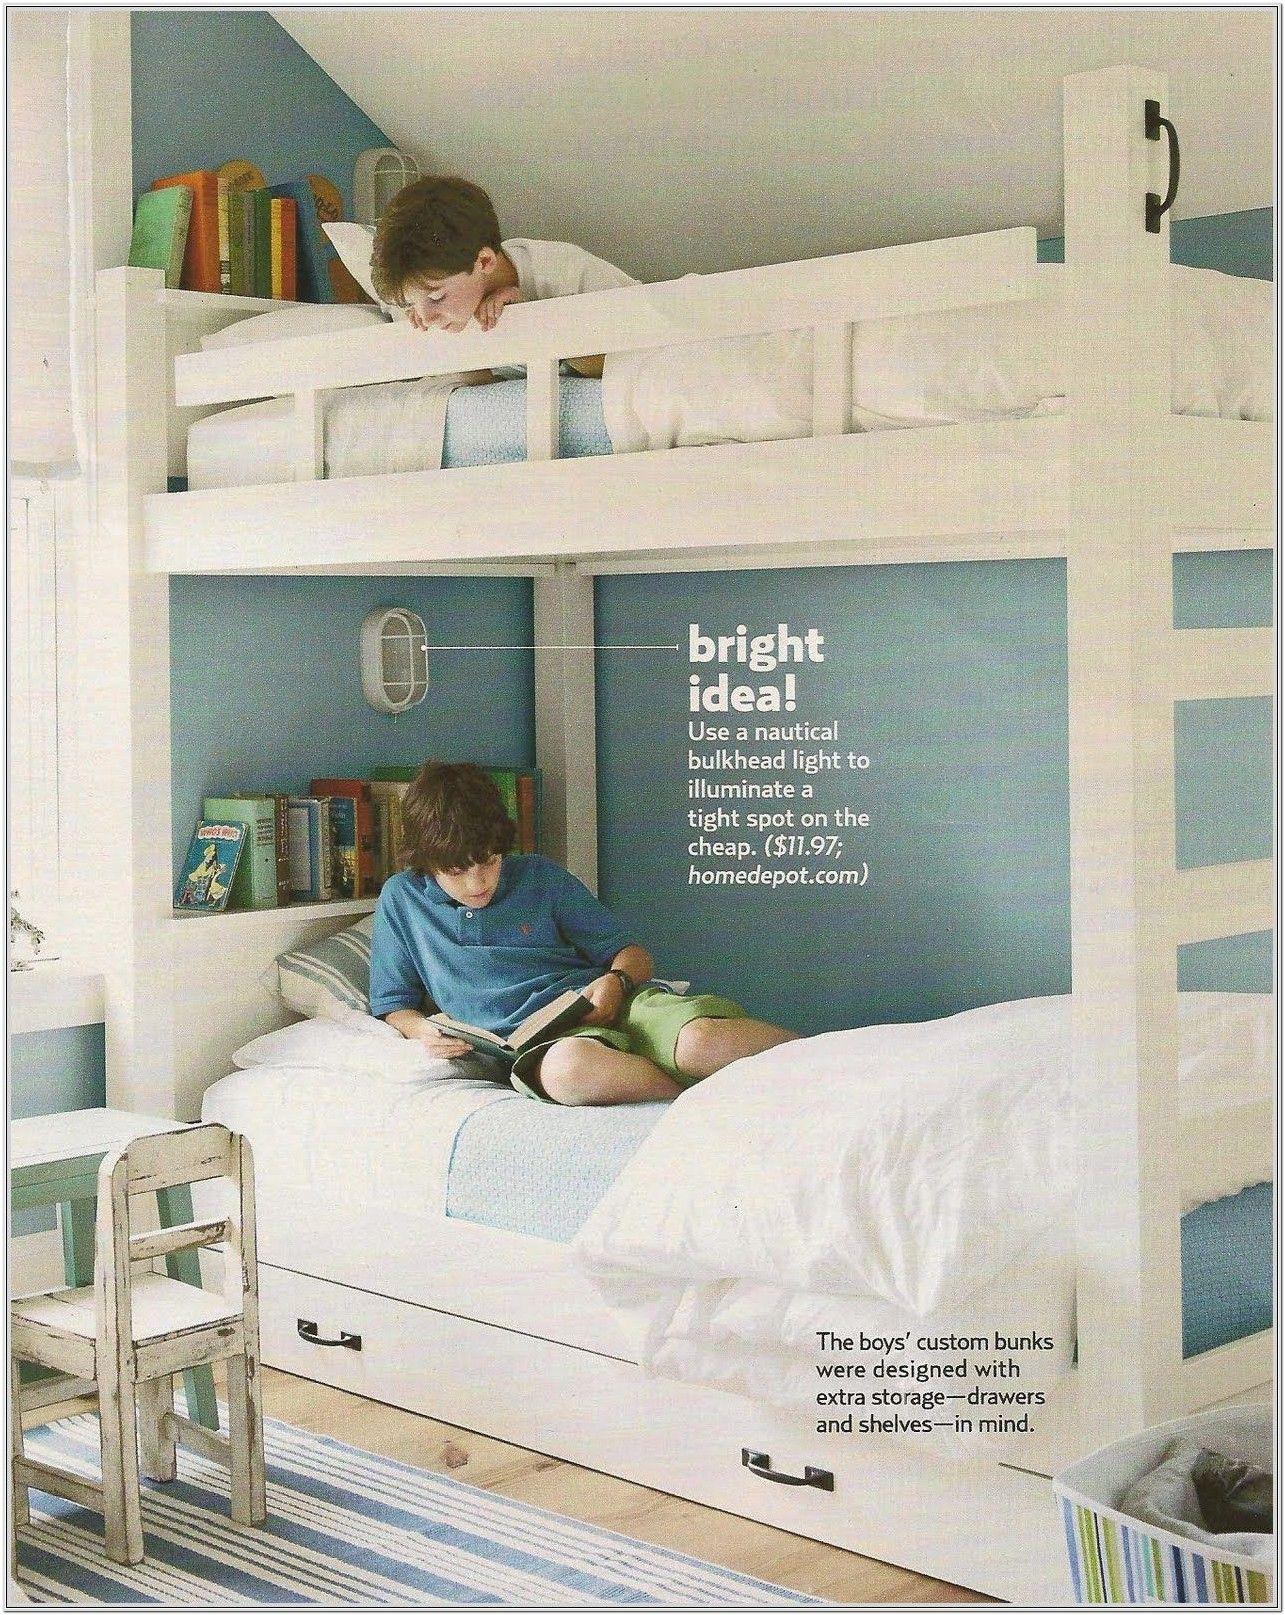 Childrens Bedroom Decor Ideas Uk Kids Loft Beds Bunk Beds With Drawers Loft Bunk Beds